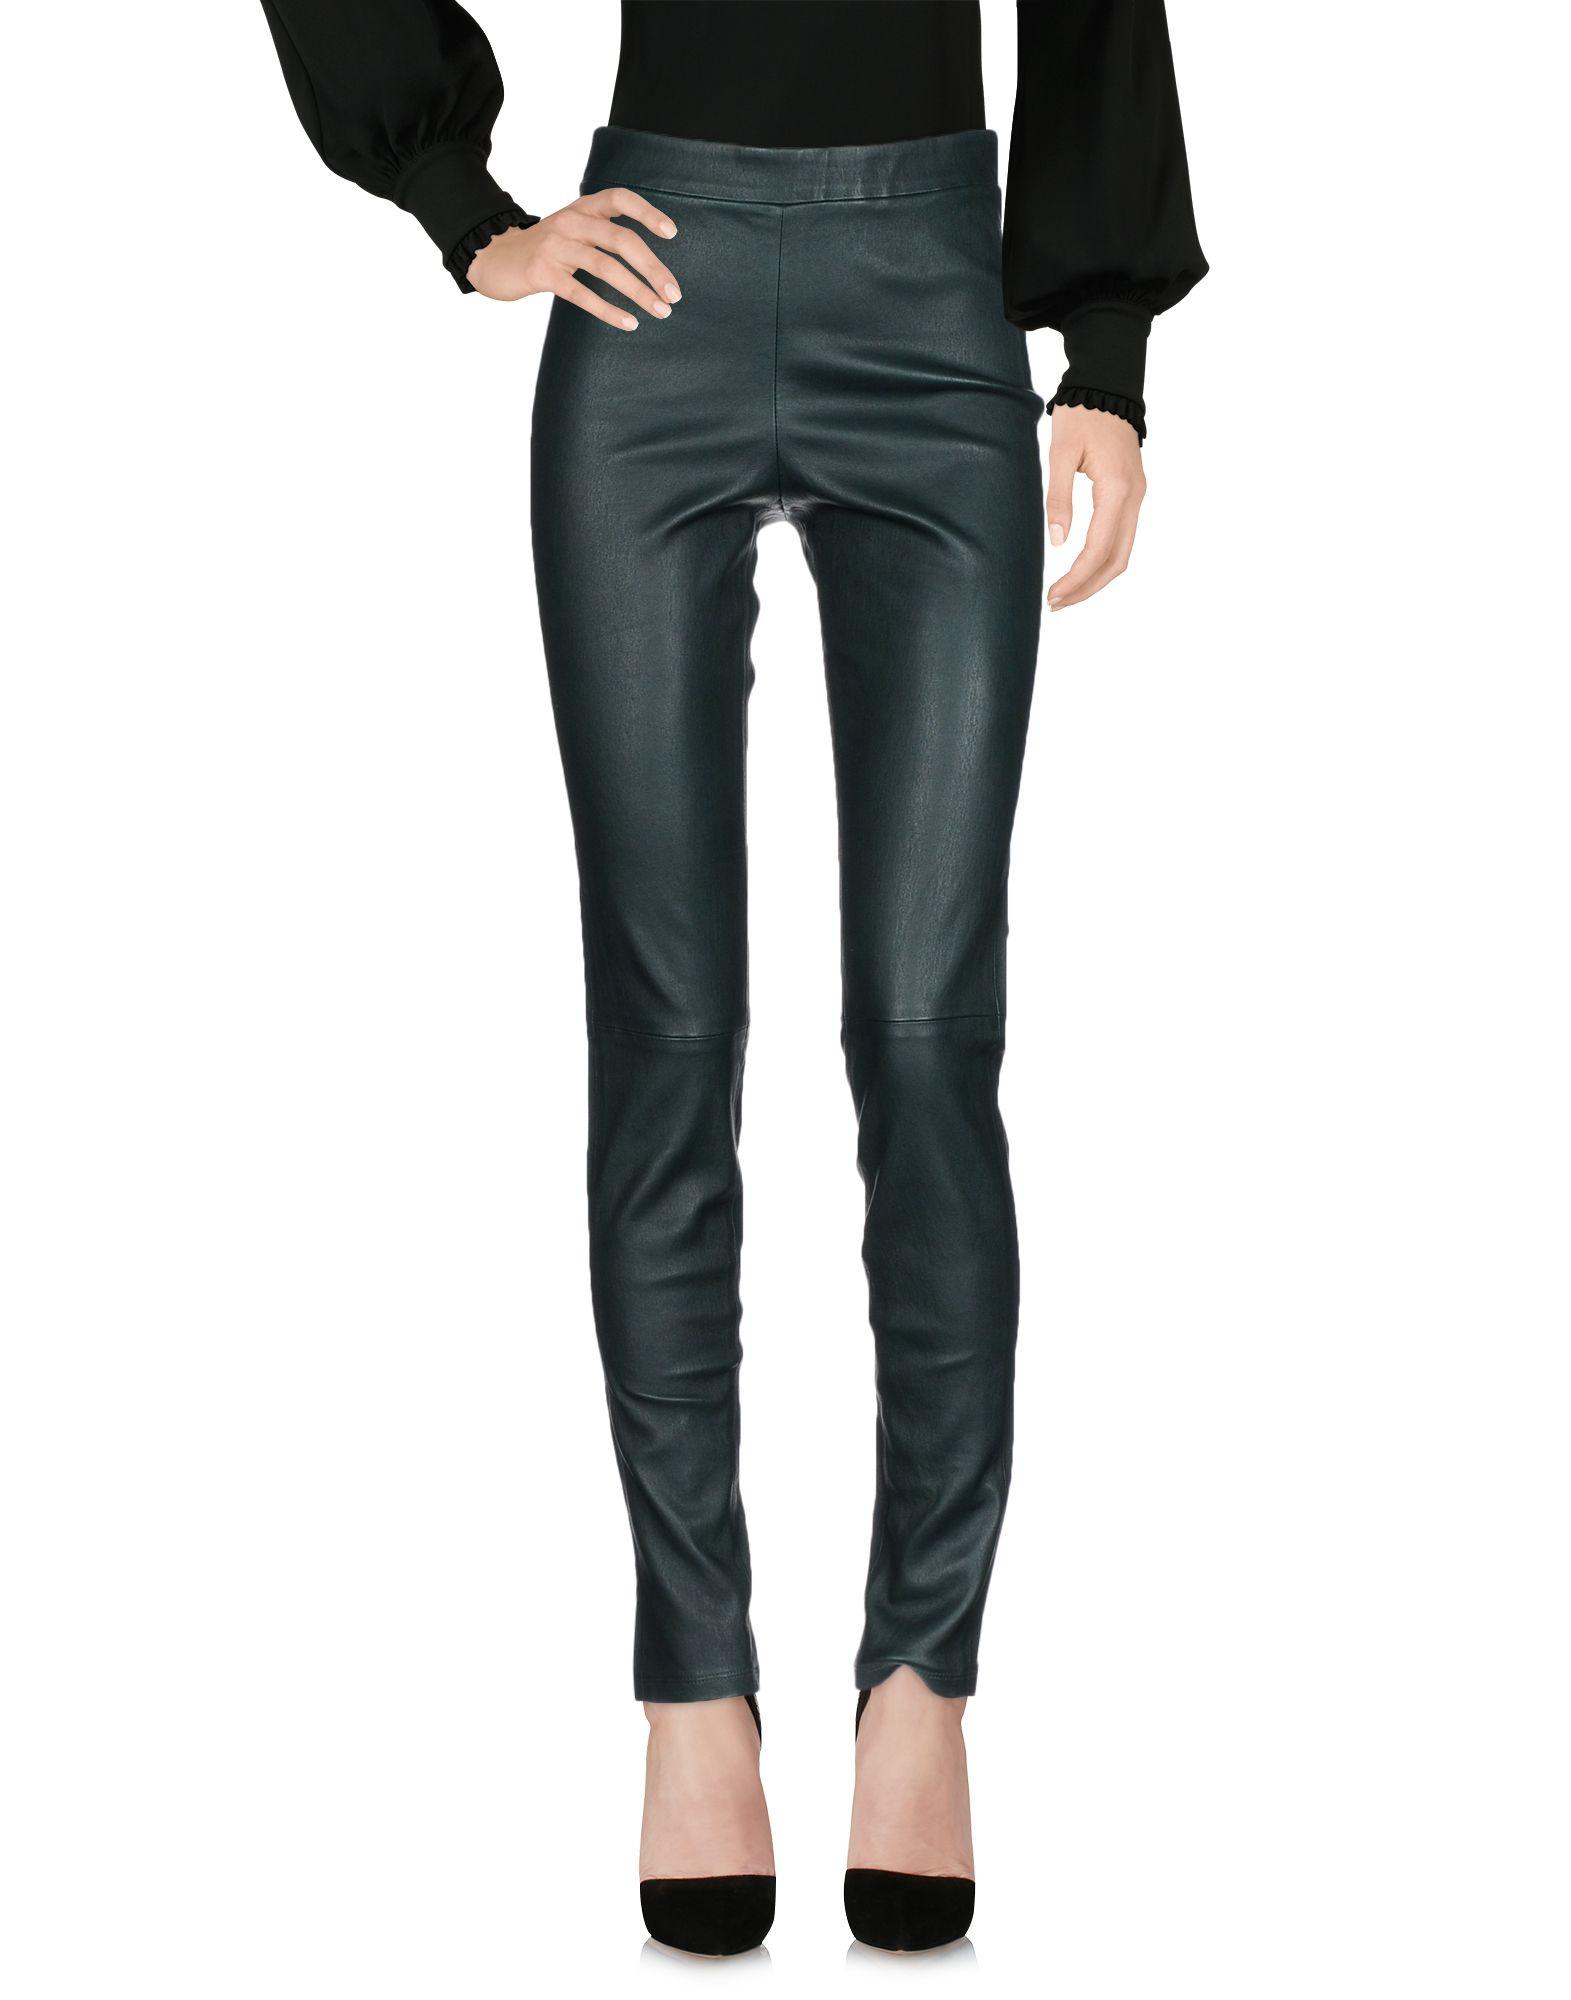 Pantalone Theory Donna - Acquista online su aYaKg